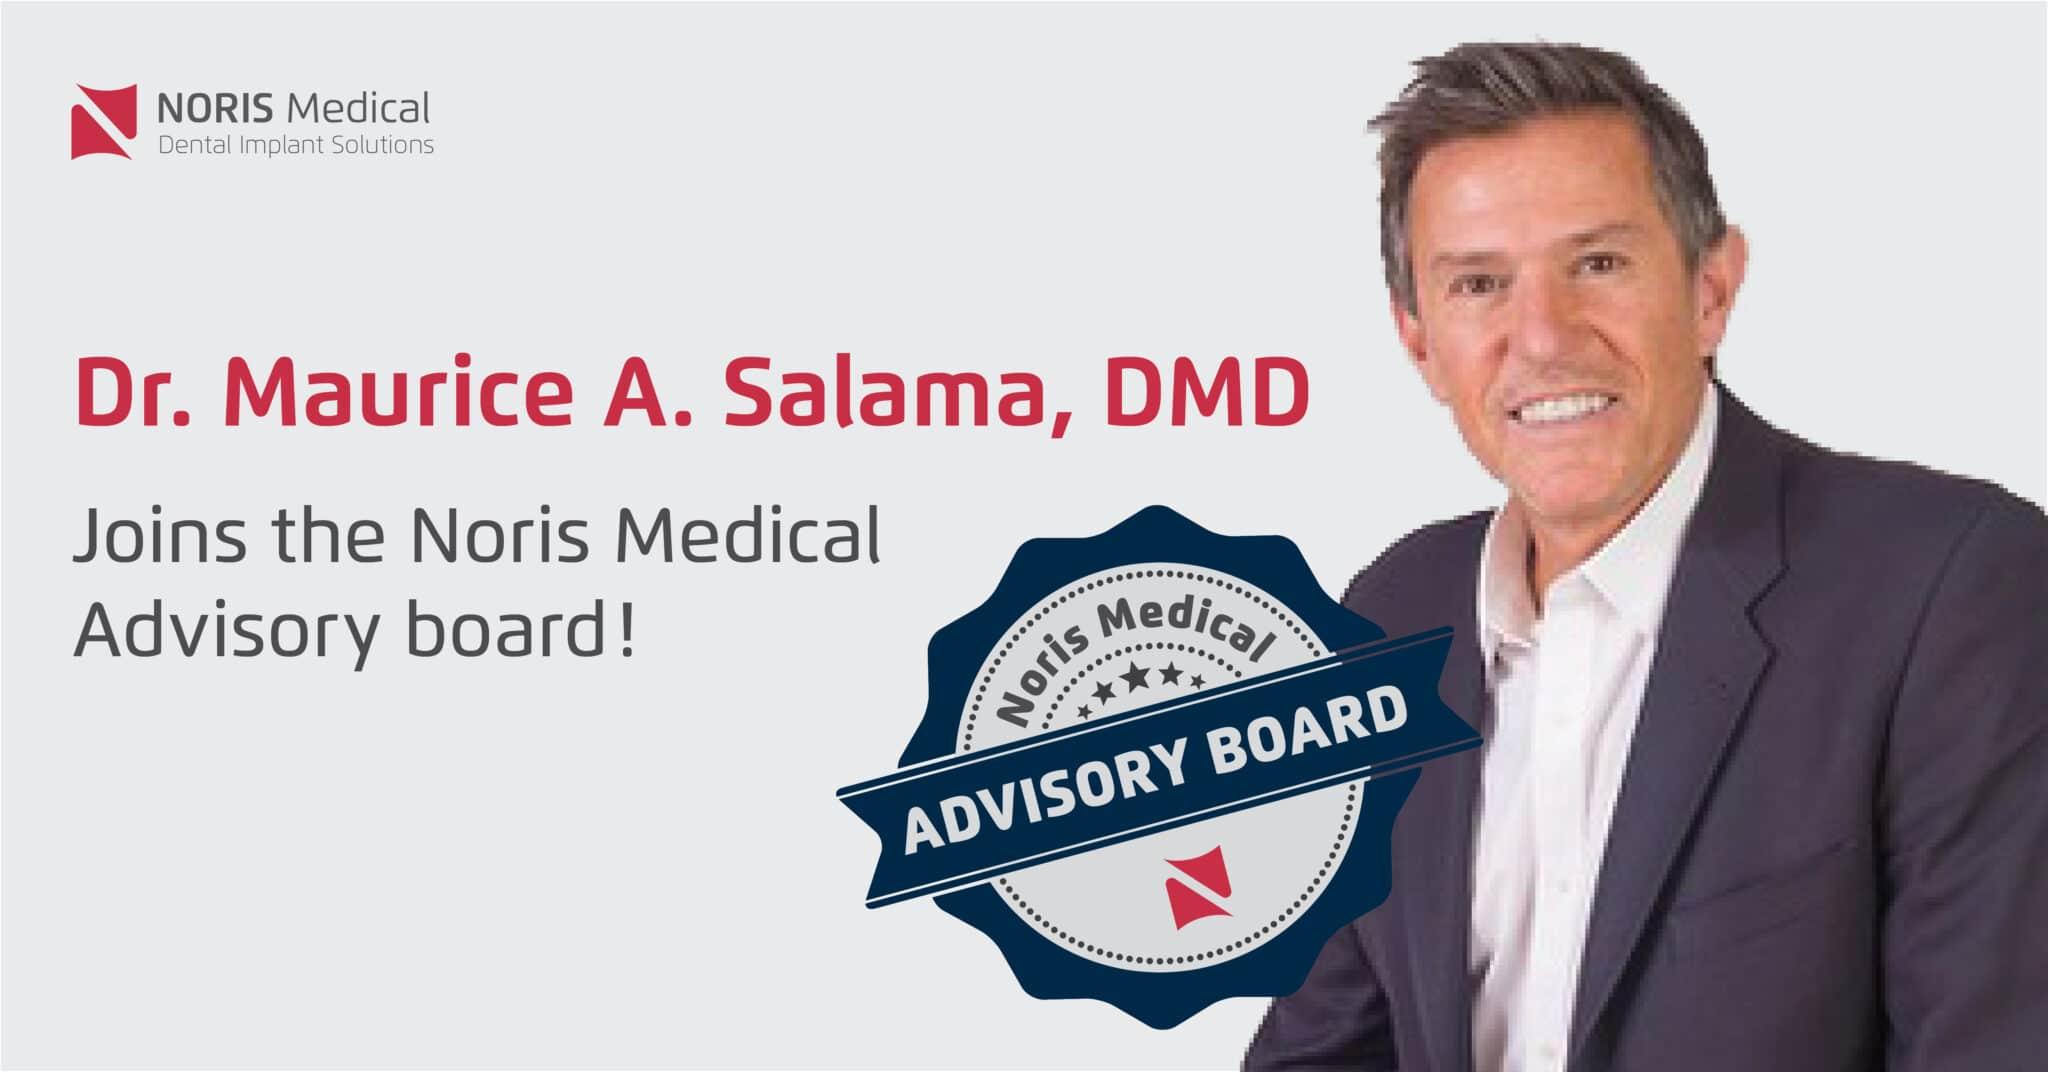 Dr. Maurice A. Salama, DMD